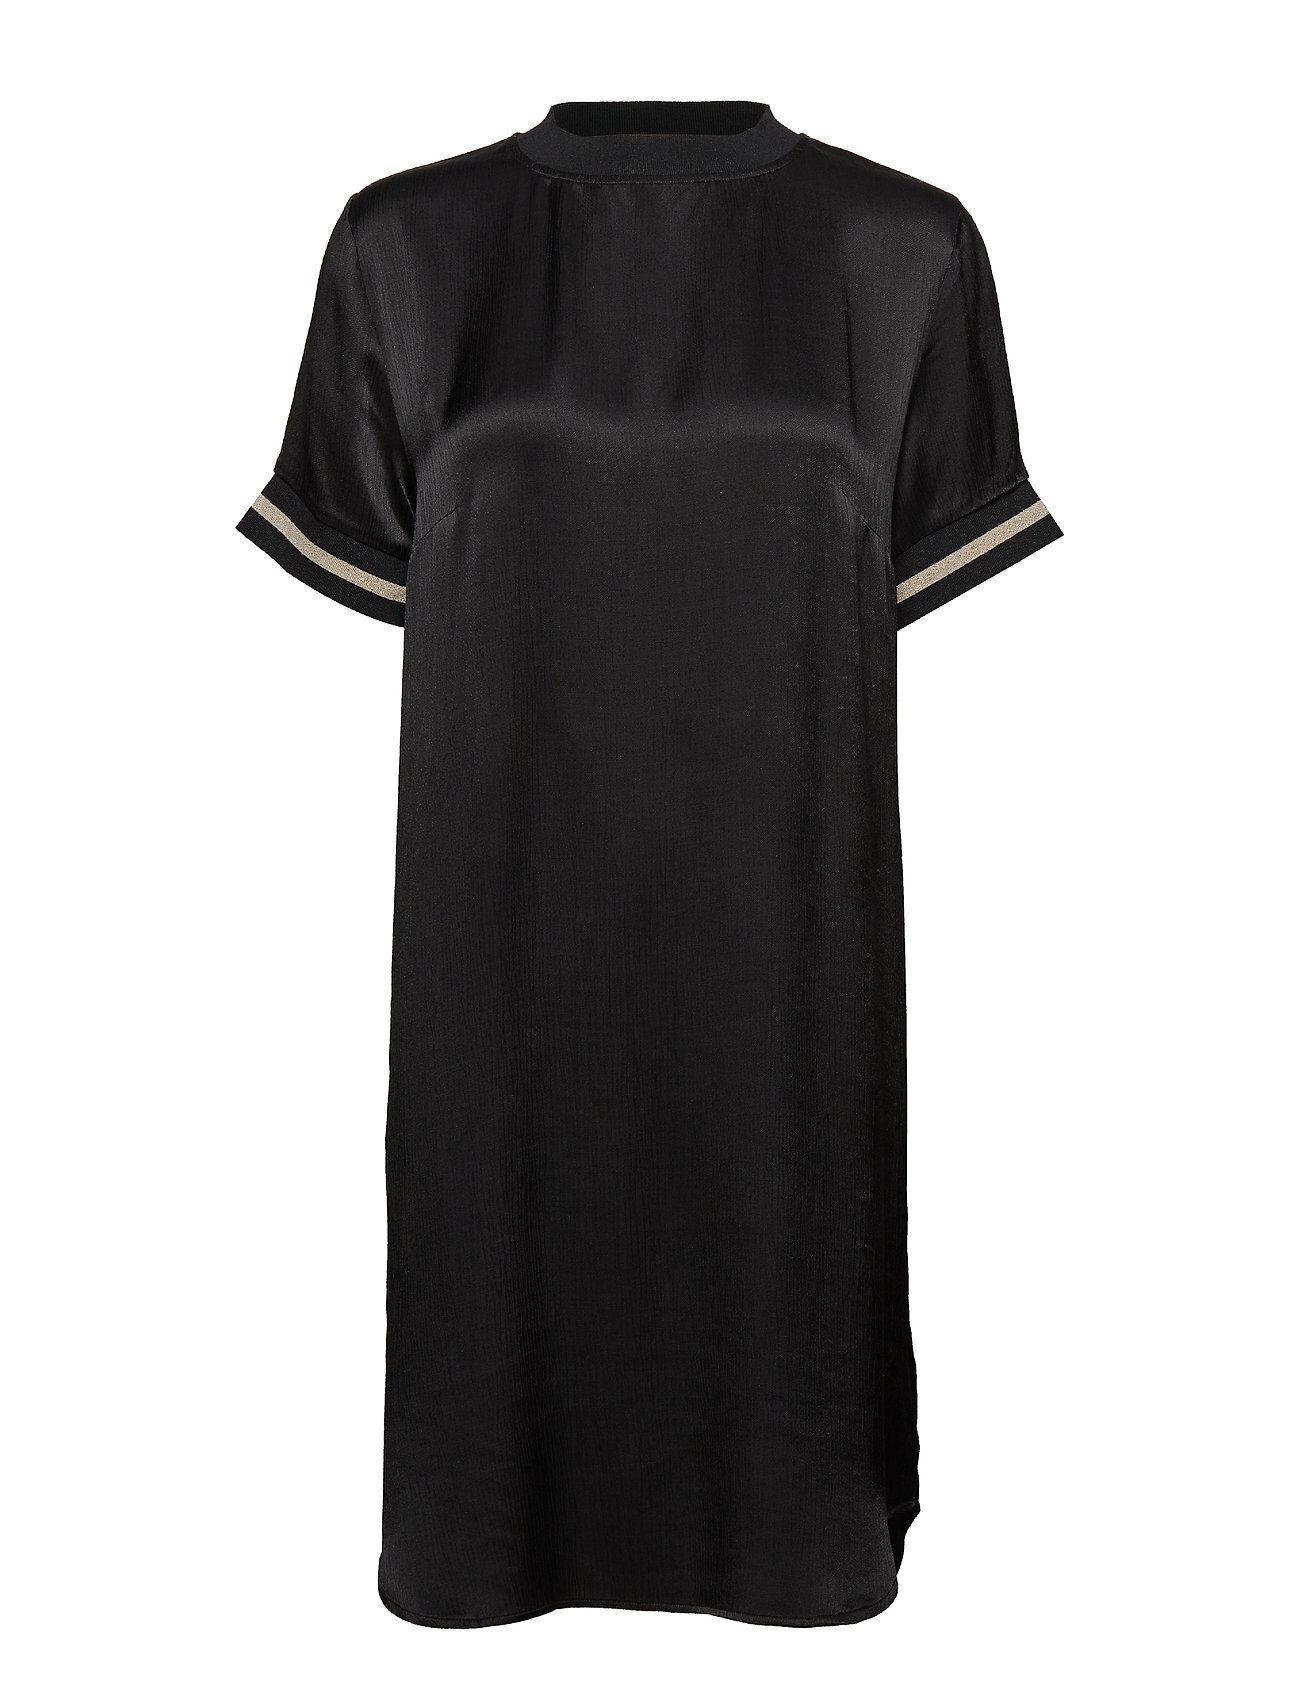 Bruuns Bazaar Cilla Evelyn Dress